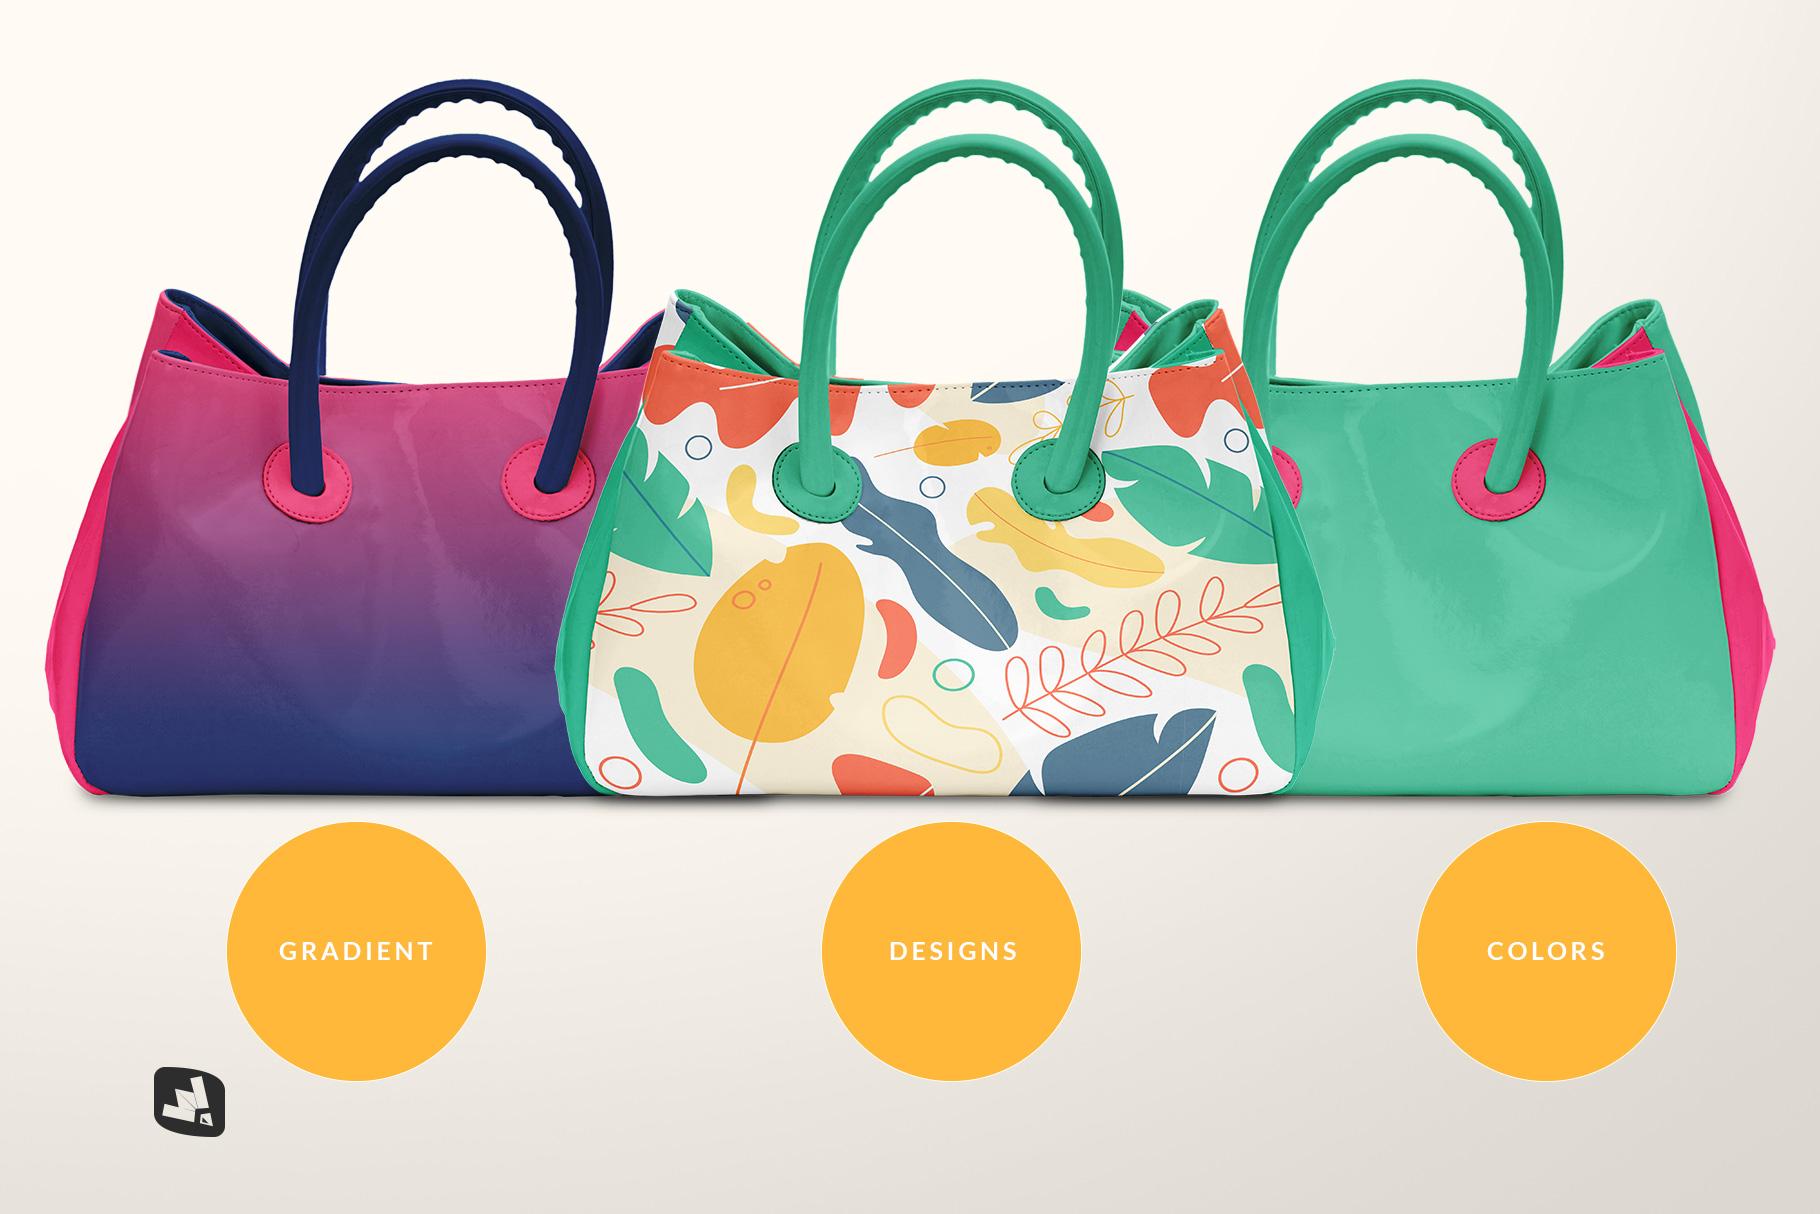 types of the female handbag mockup